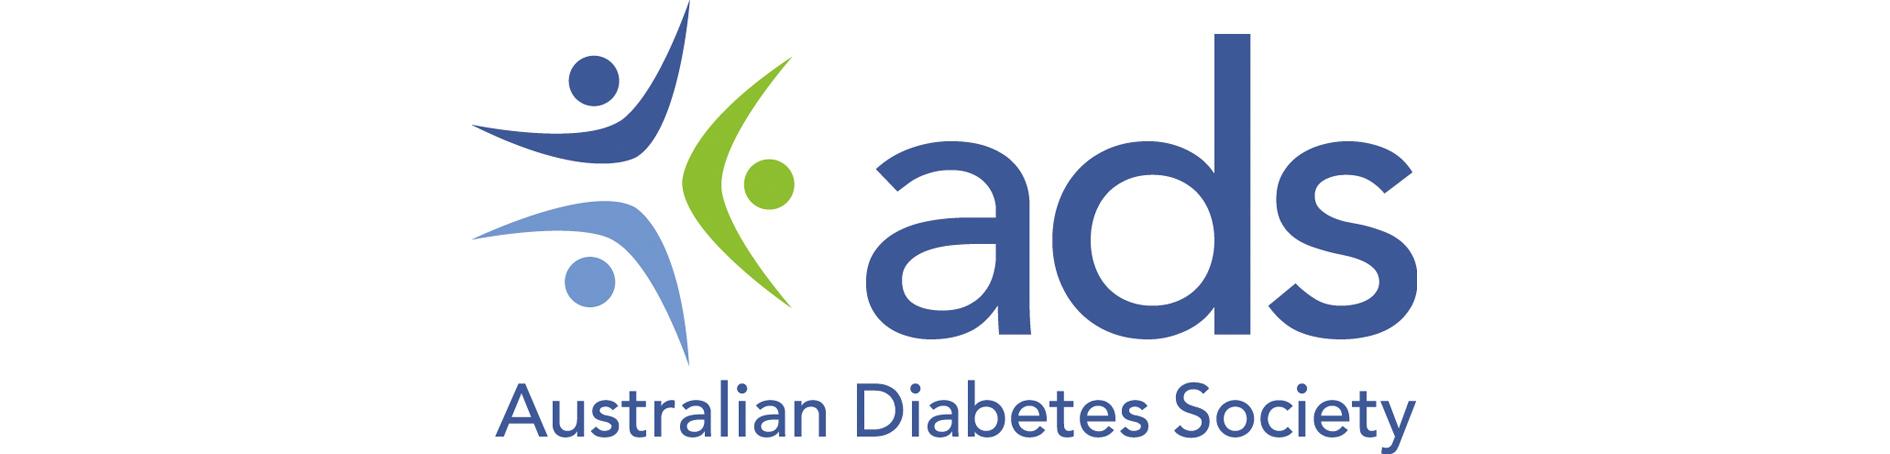 ads-logo-hd.jpg